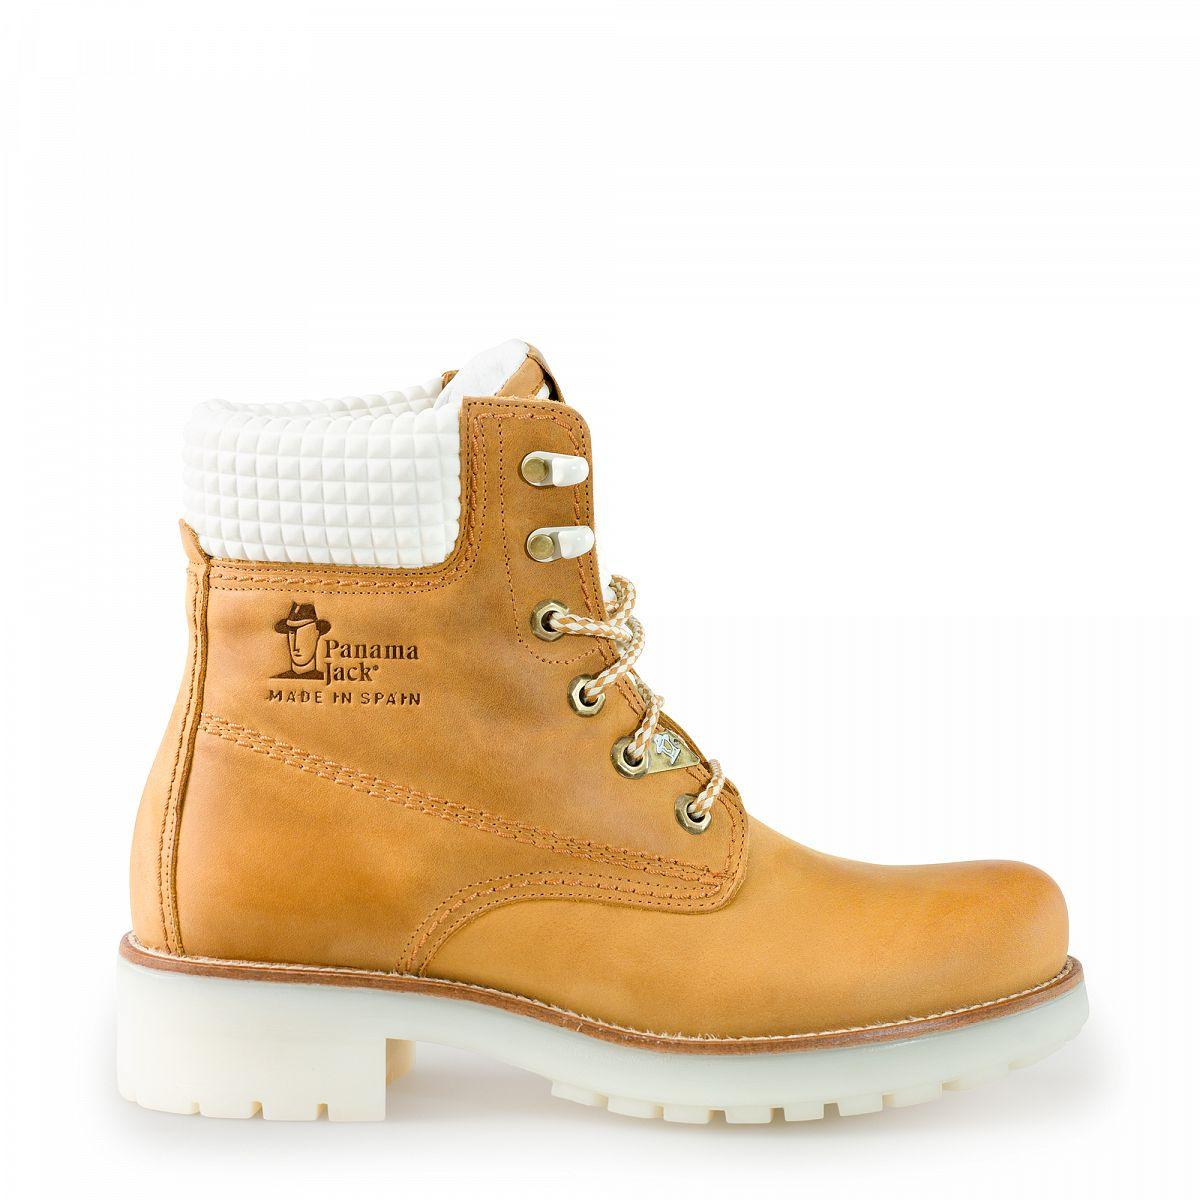 womens boots panama 03 neo blanco panama jack shop. Black Bedroom Furniture Sets. Home Design Ideas